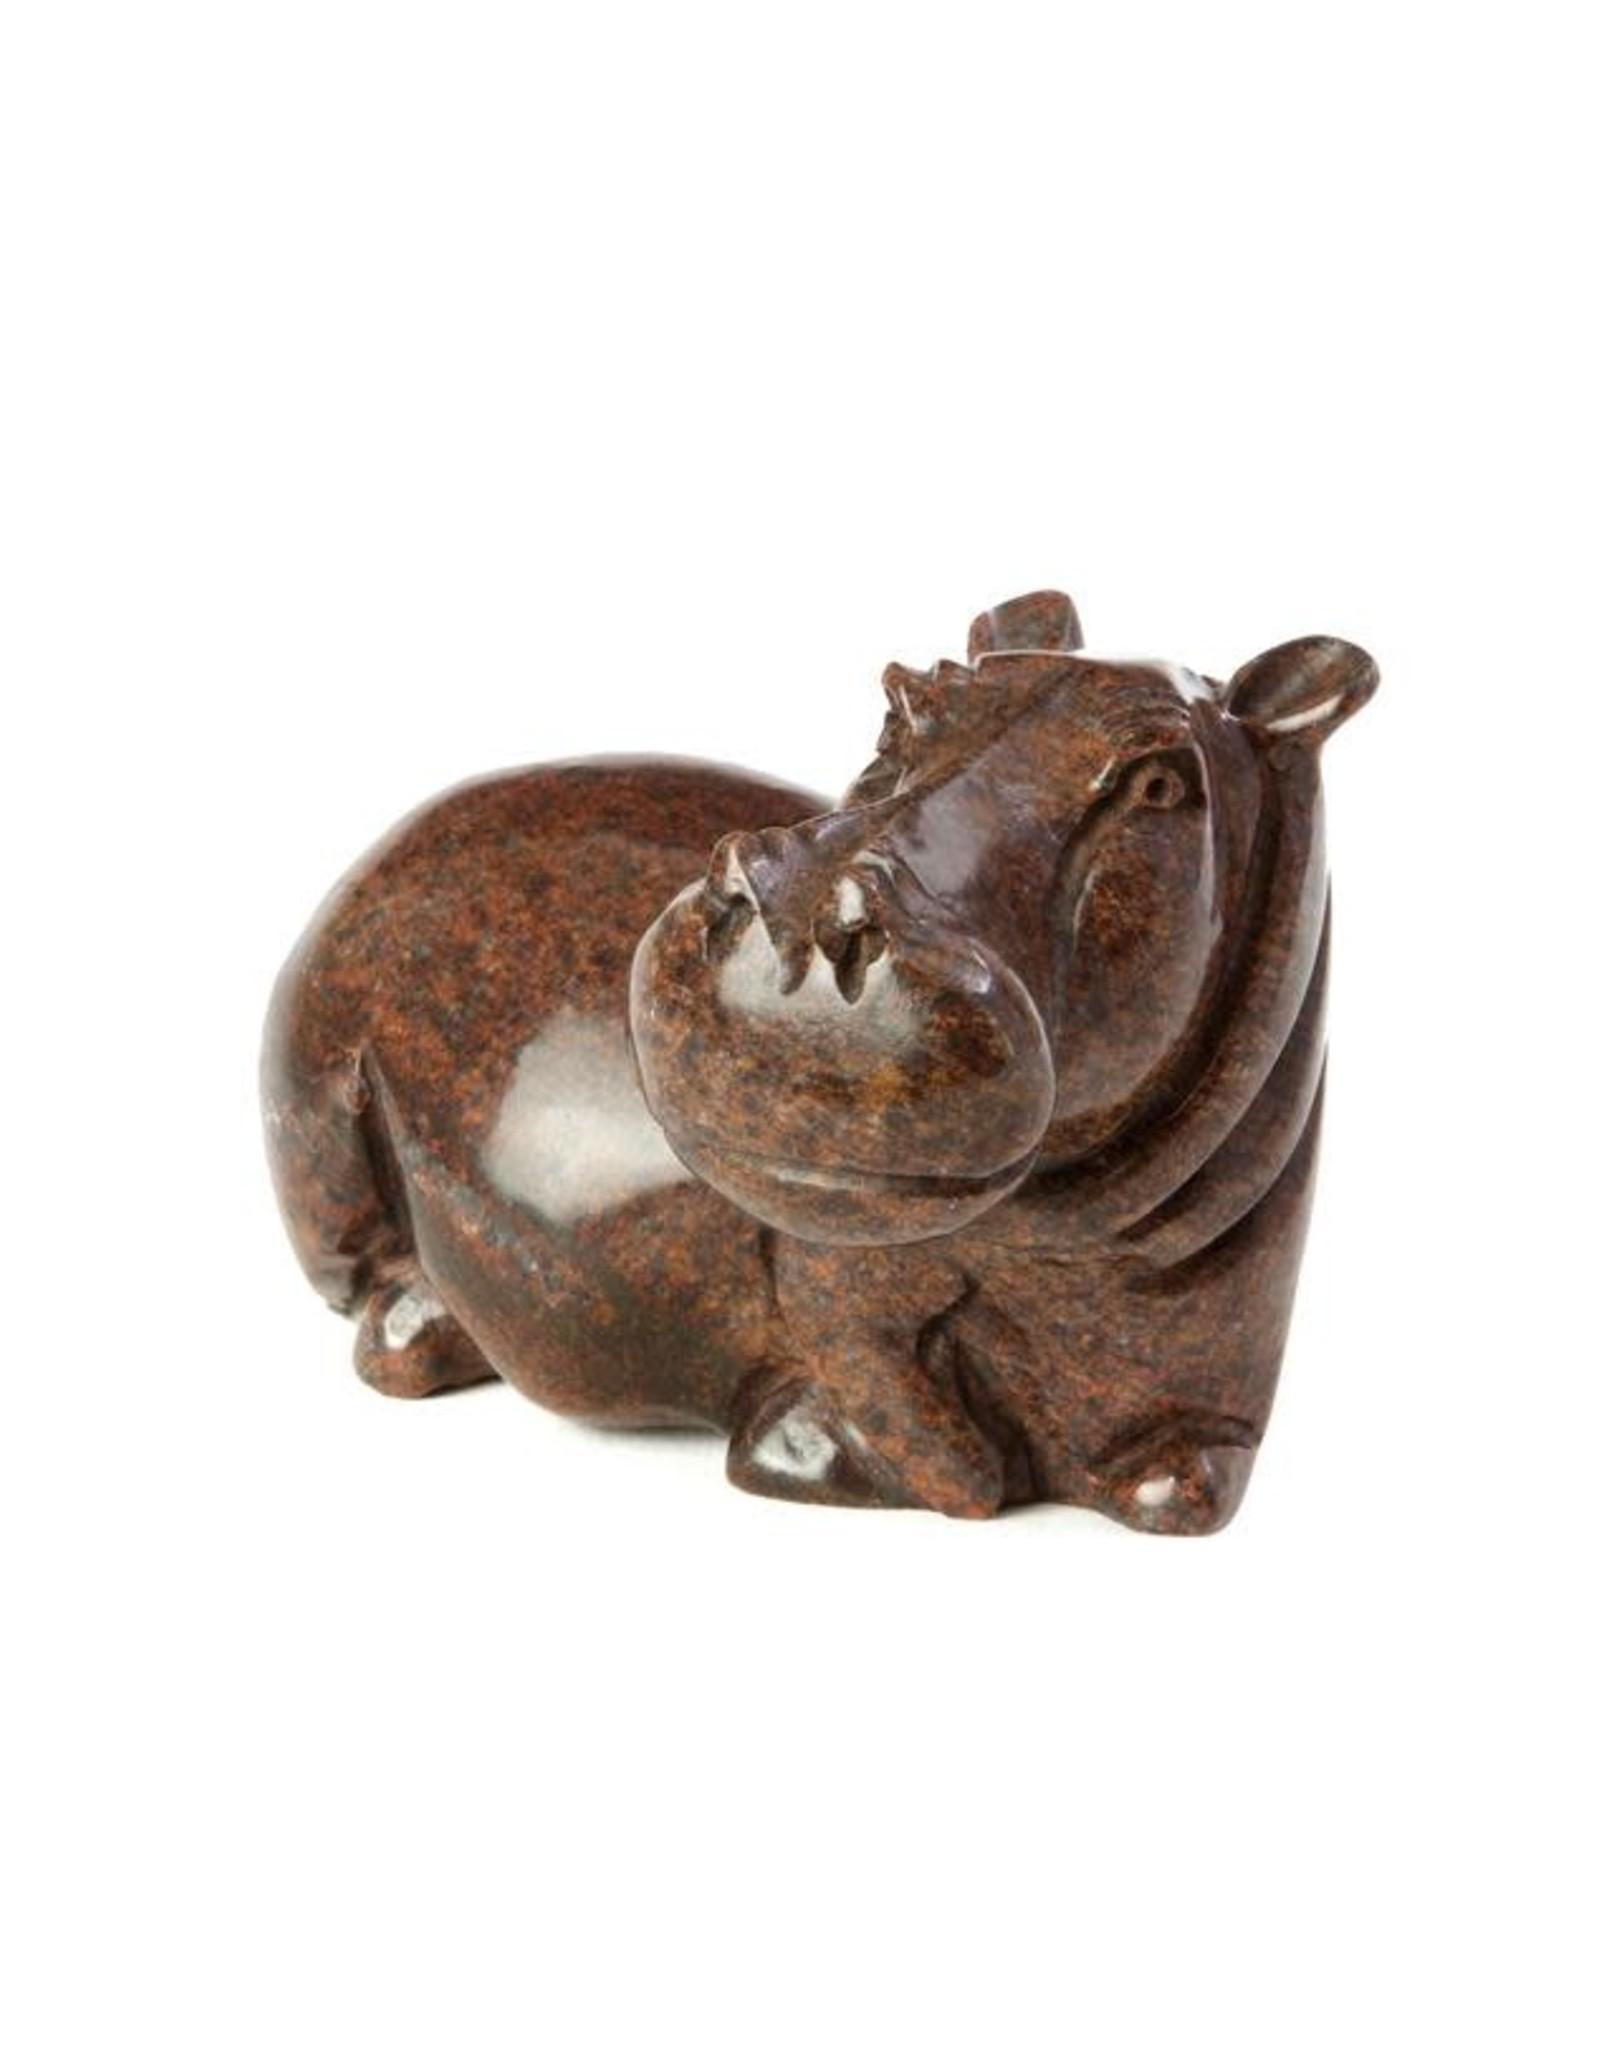 Swahili Wholesale Serpentine Hippo Sculpture, Zimbabwe